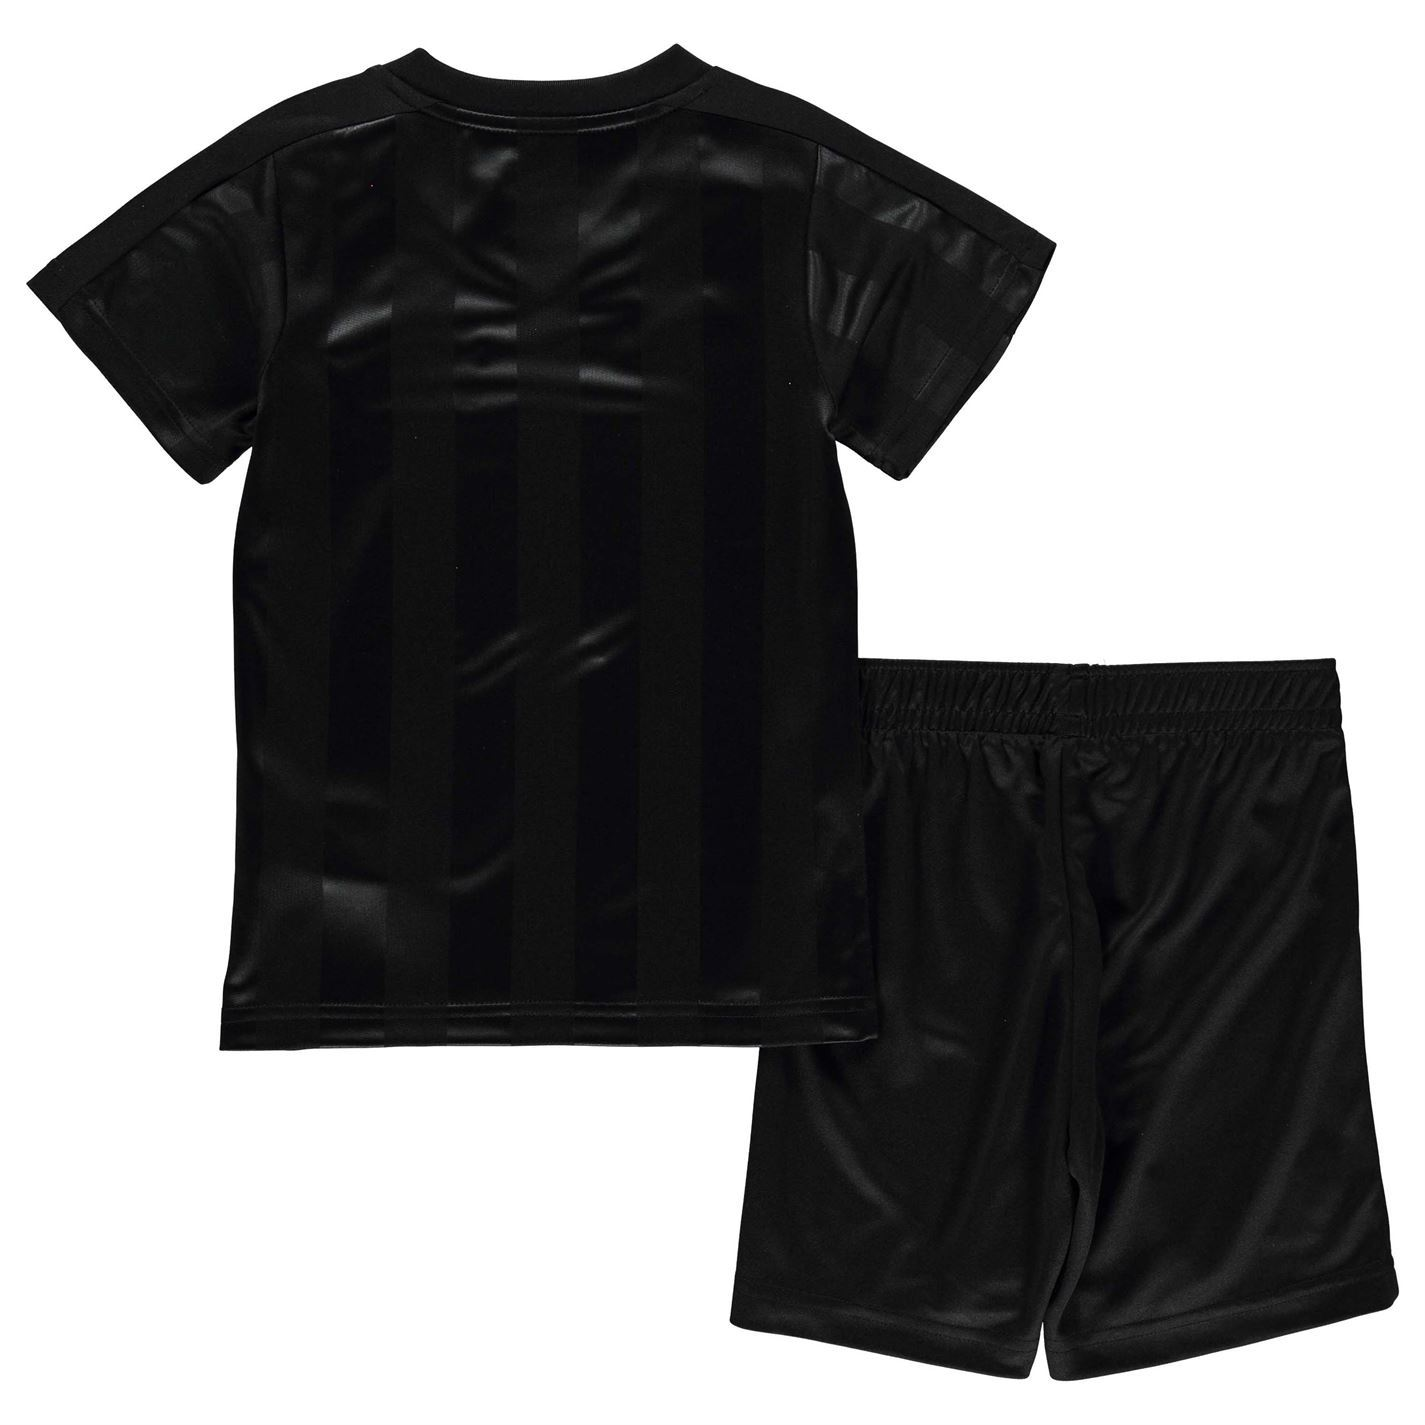 ... Puma Newcastle United Third Mini Kit 2017-18 Infants Black Football  Soccer Strip 76862127bc70d